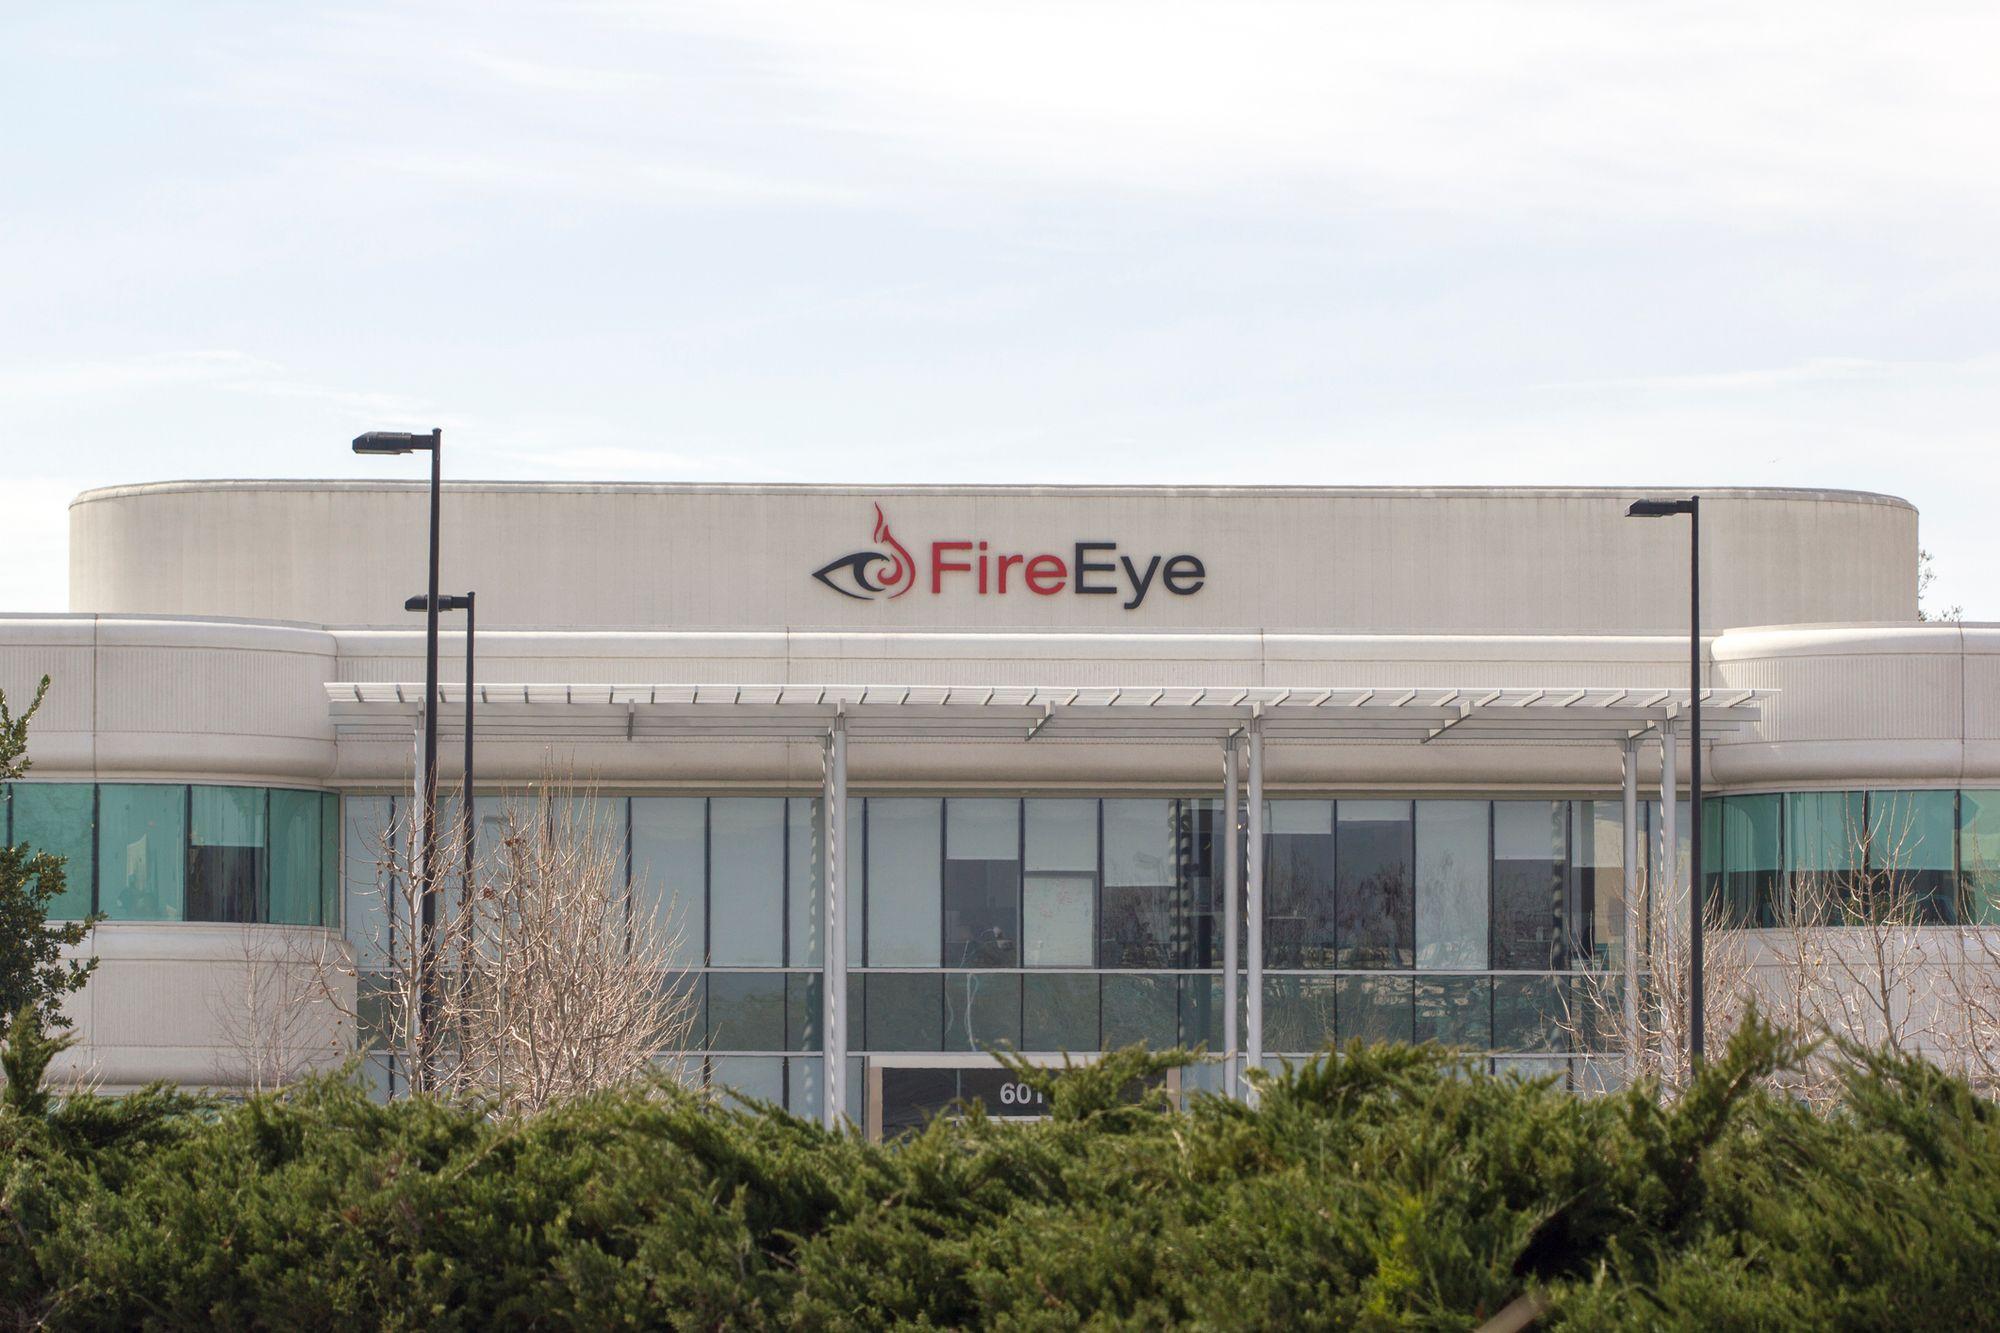 Sede da FireEye em Milpitas, Califórnia. Foto: Hapabapa via iStock.